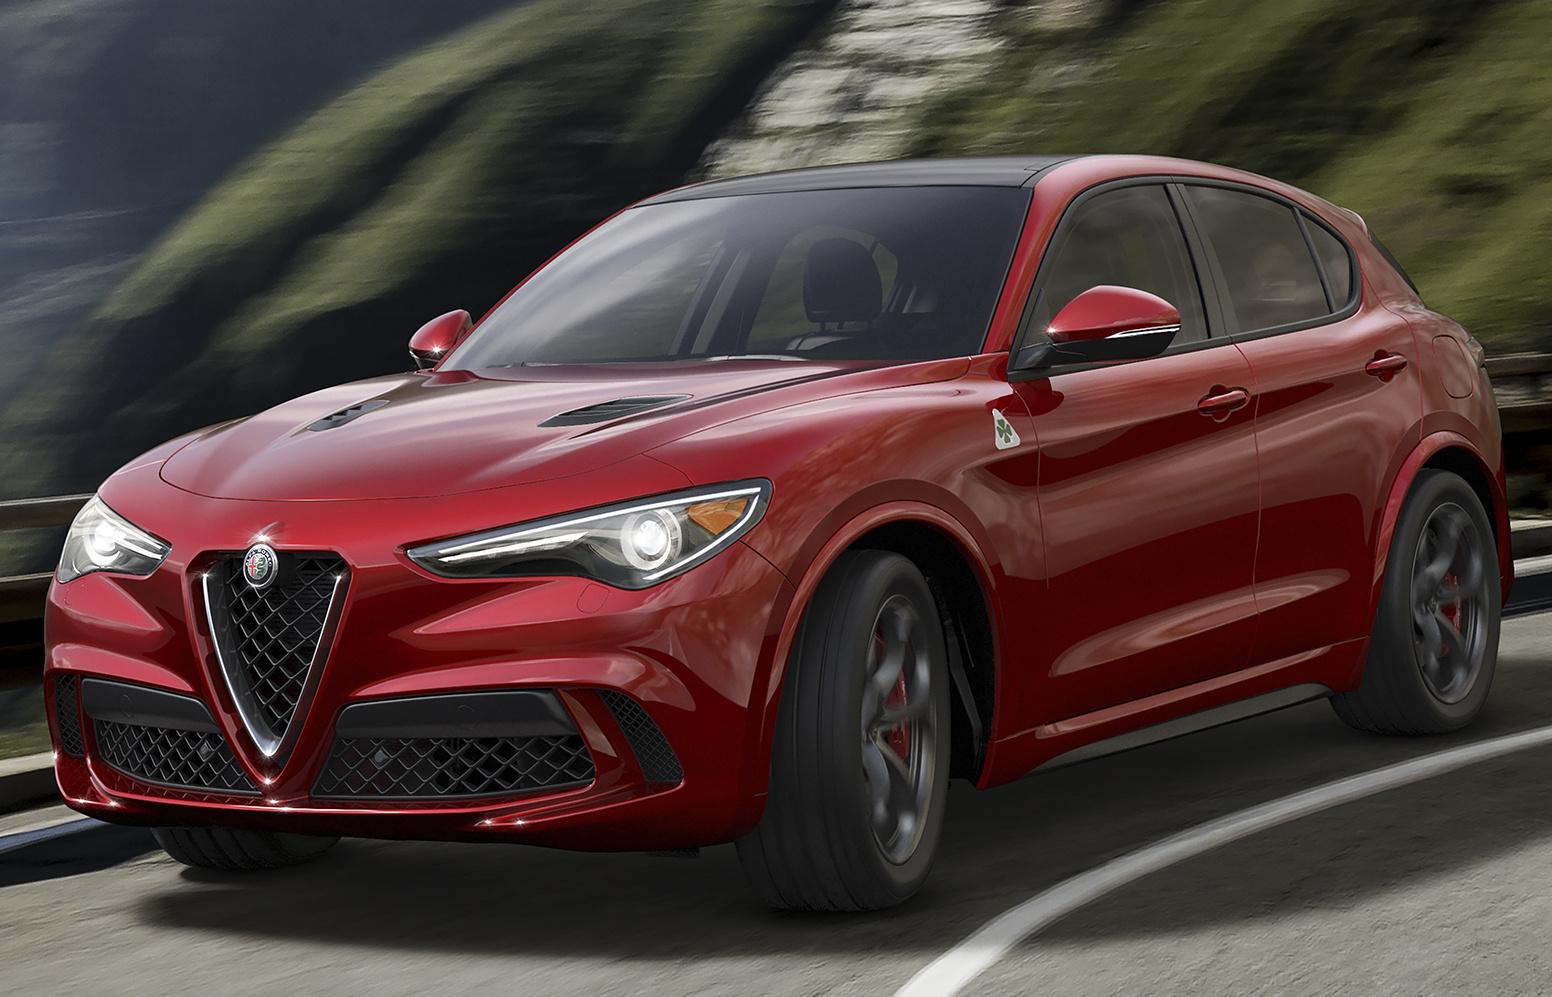 2018 Alfa Romeo Stelvio For Sale In Baltimore, Md Cargurus